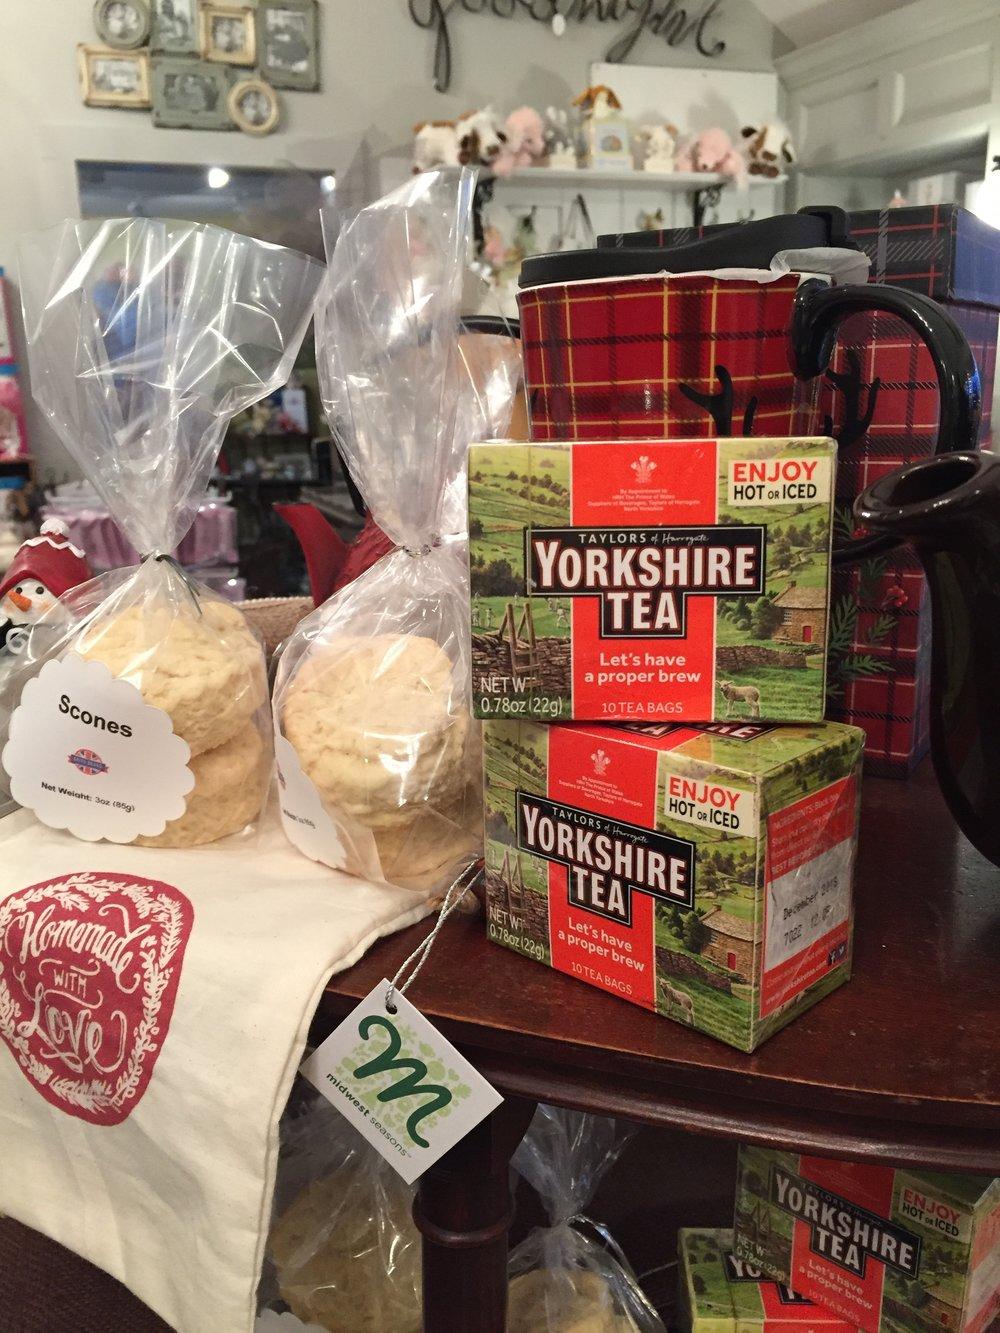 Yorkshire tea!